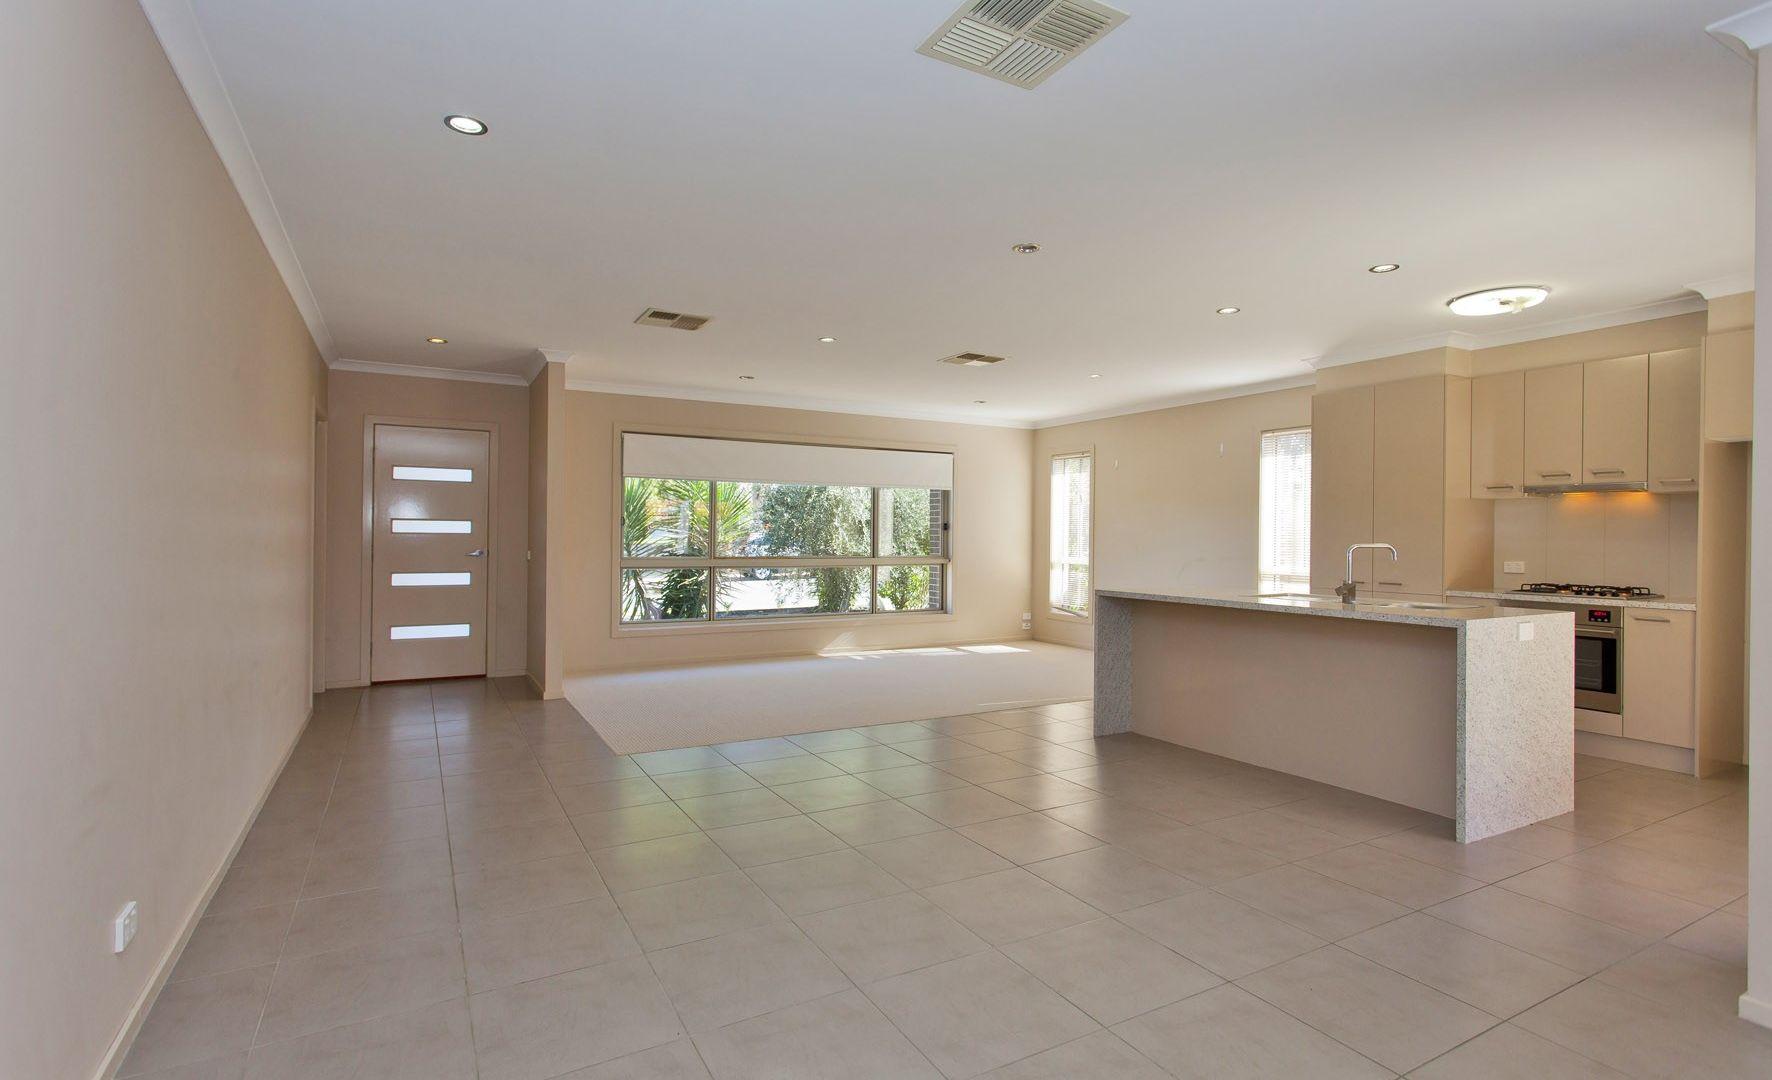 1/462 Parnall Street, Lavington NSW 2641, Image 1